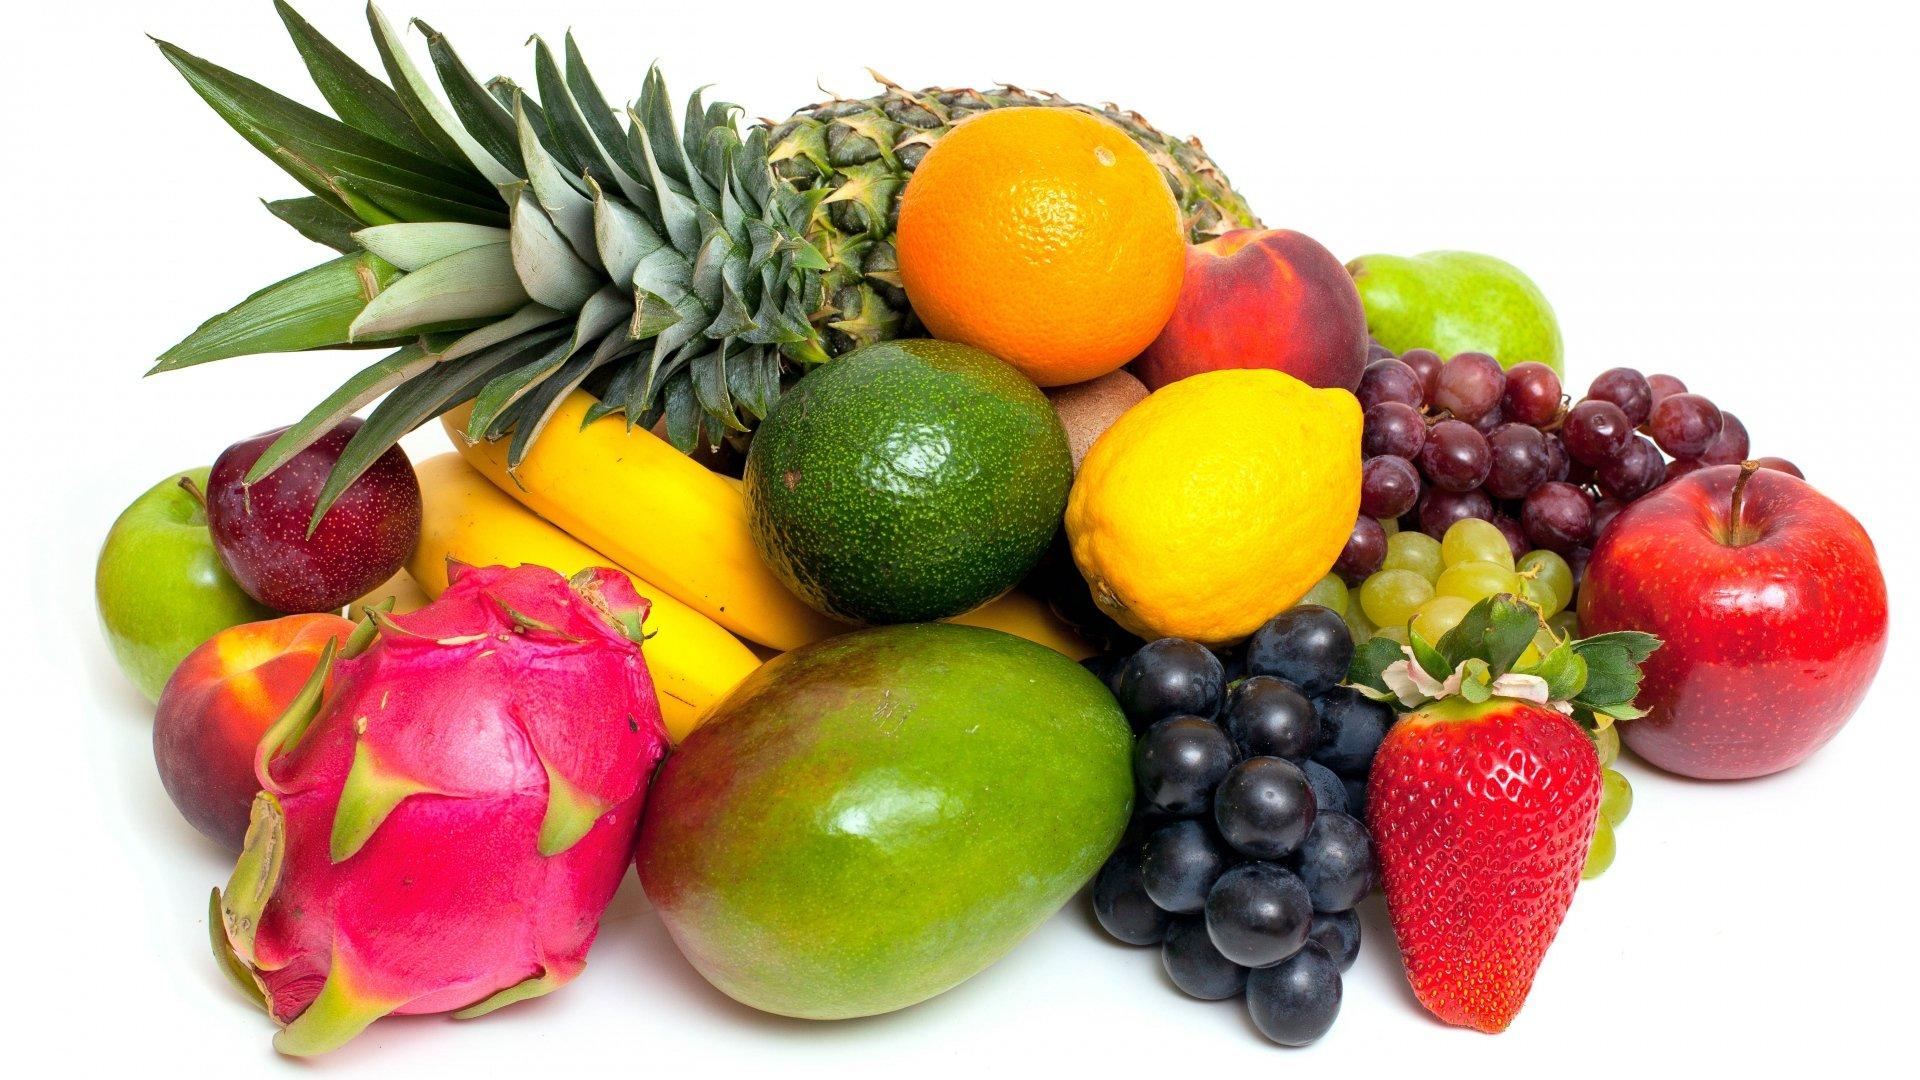 exotic fruits Jene's tropical fruit – buy exotic fruit trees, flowering trees, and tropical plants online – miracle fruit, pomegranate, passionfruit, starfruit, mango, citrus, kaffir lime, lemon, lychee, avocado, cloves, nutmeg, and more.